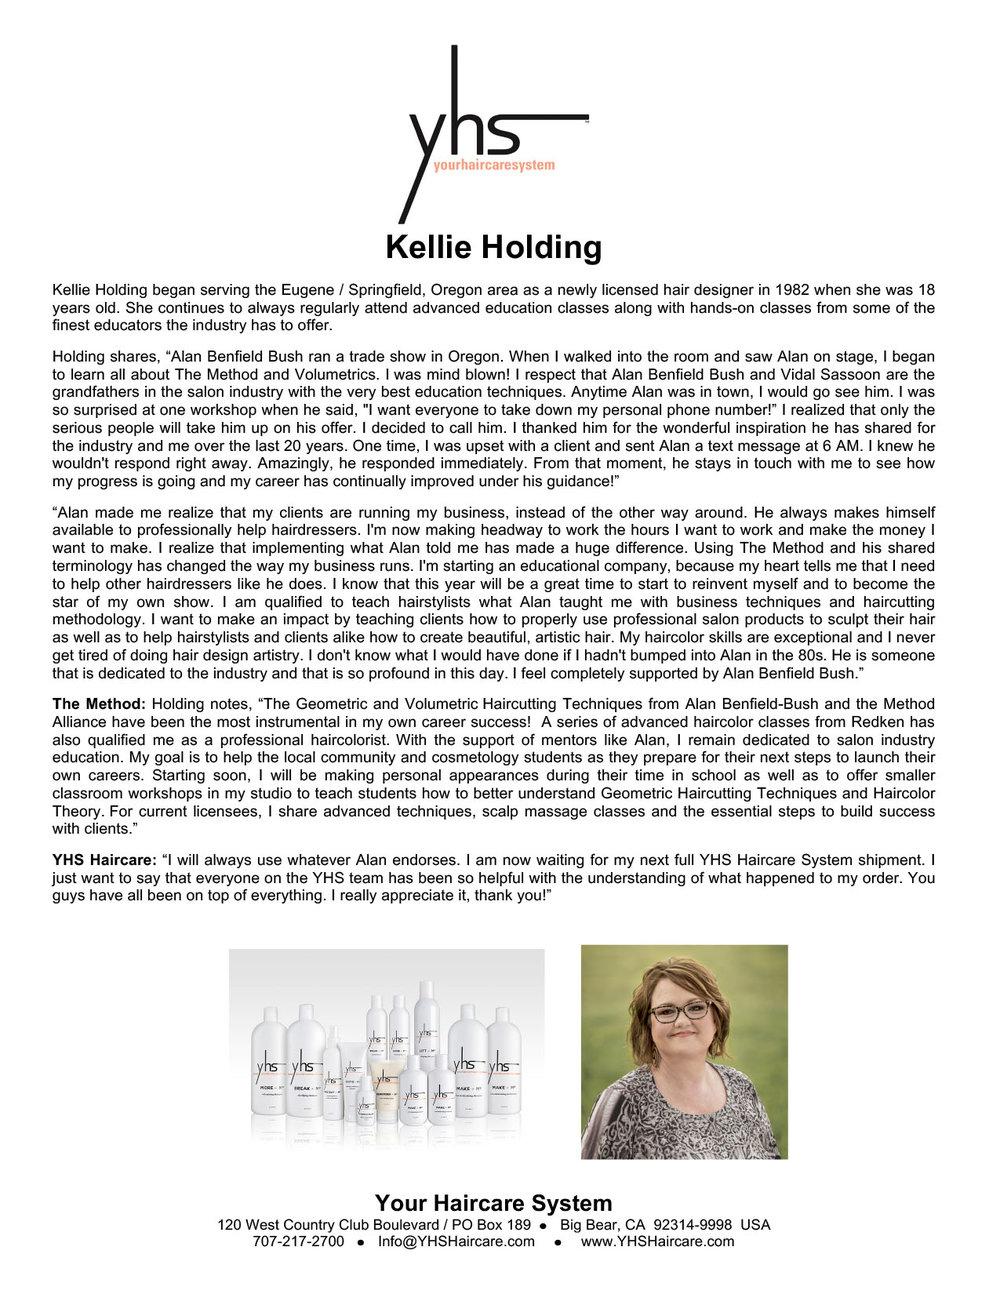 Kellie Holding Testimonial – YHS Haircare